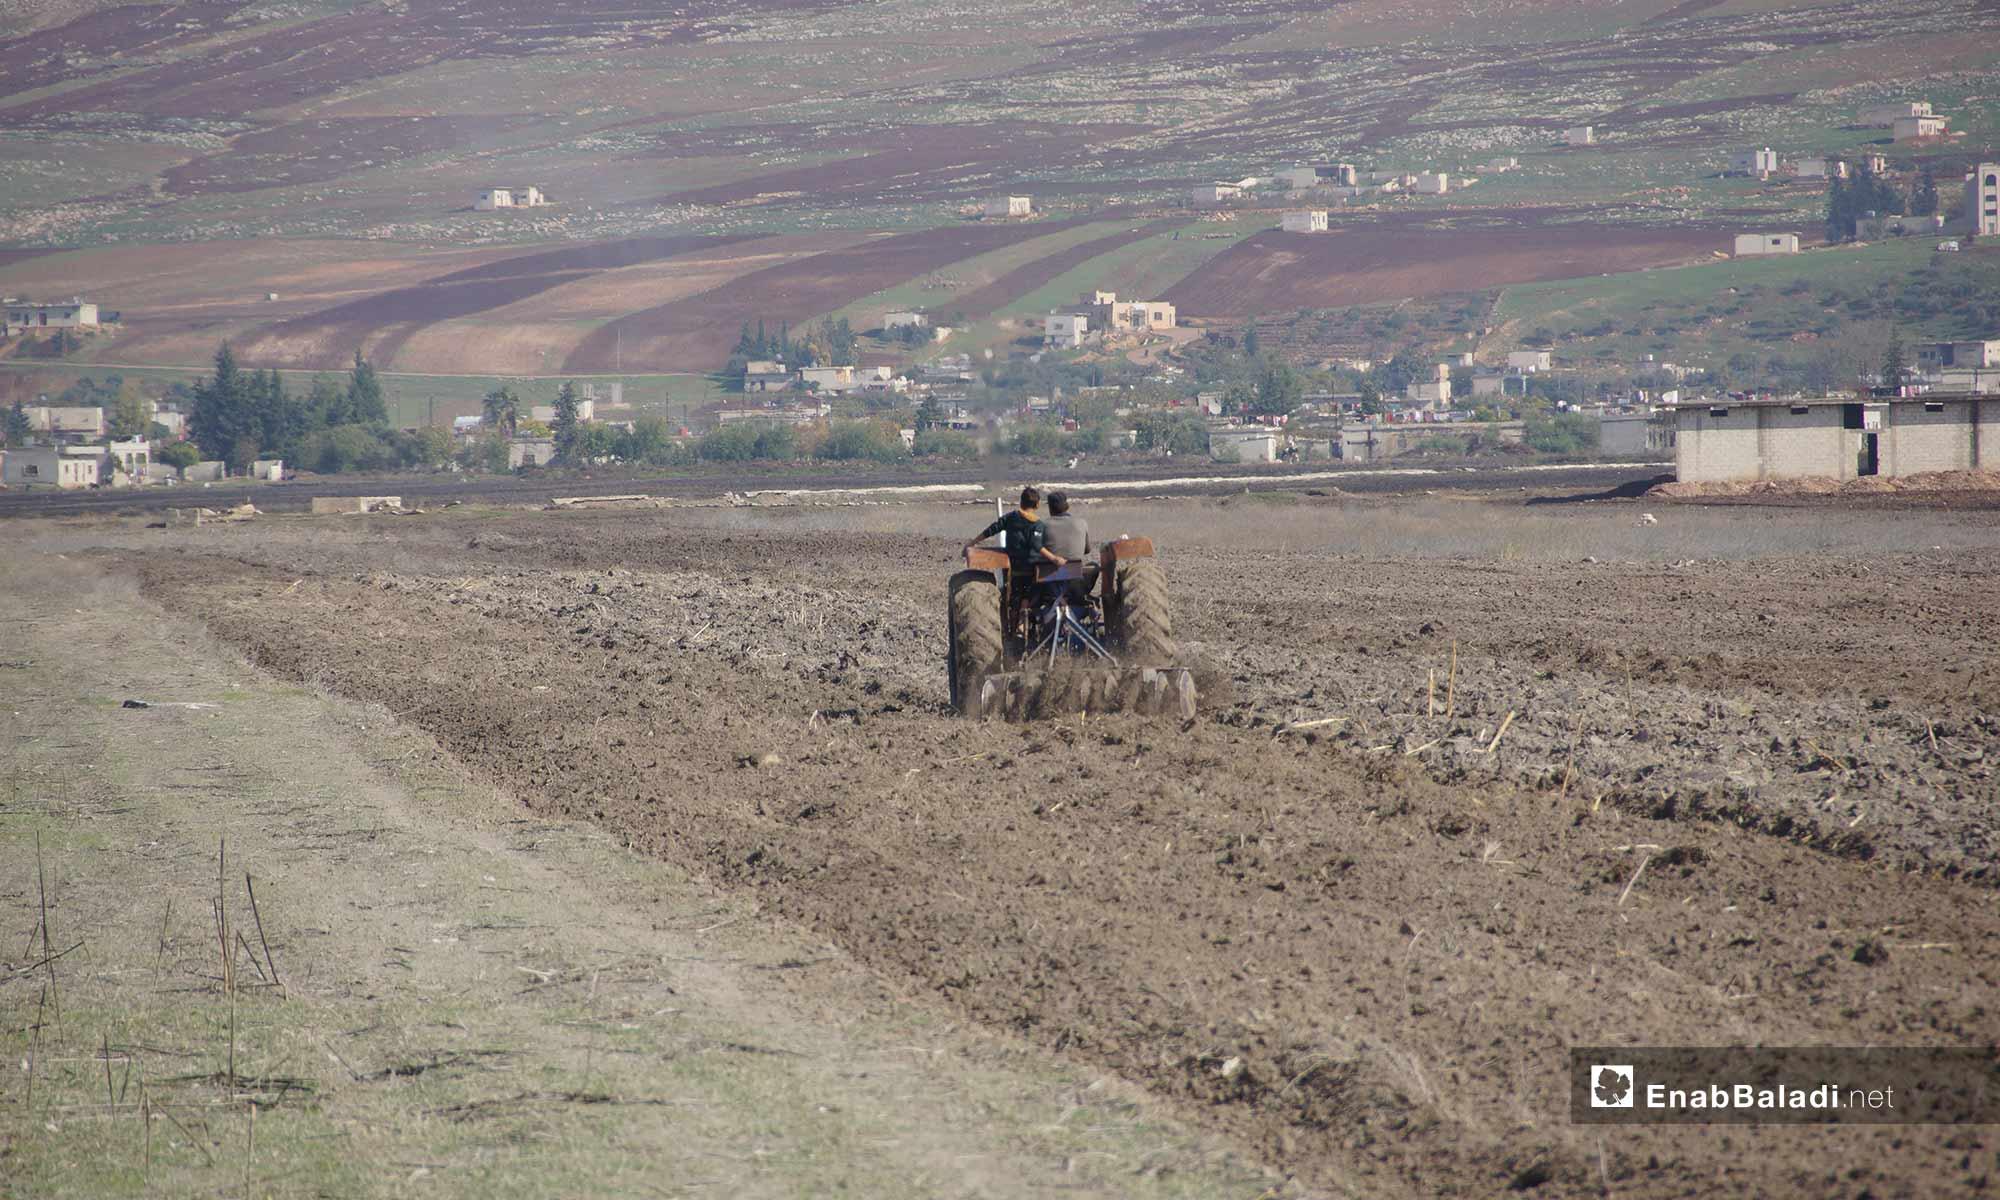 The start of the planting season in al-Ghab Plain, rural Hama – November 26, 2018 (Enab Baladi)